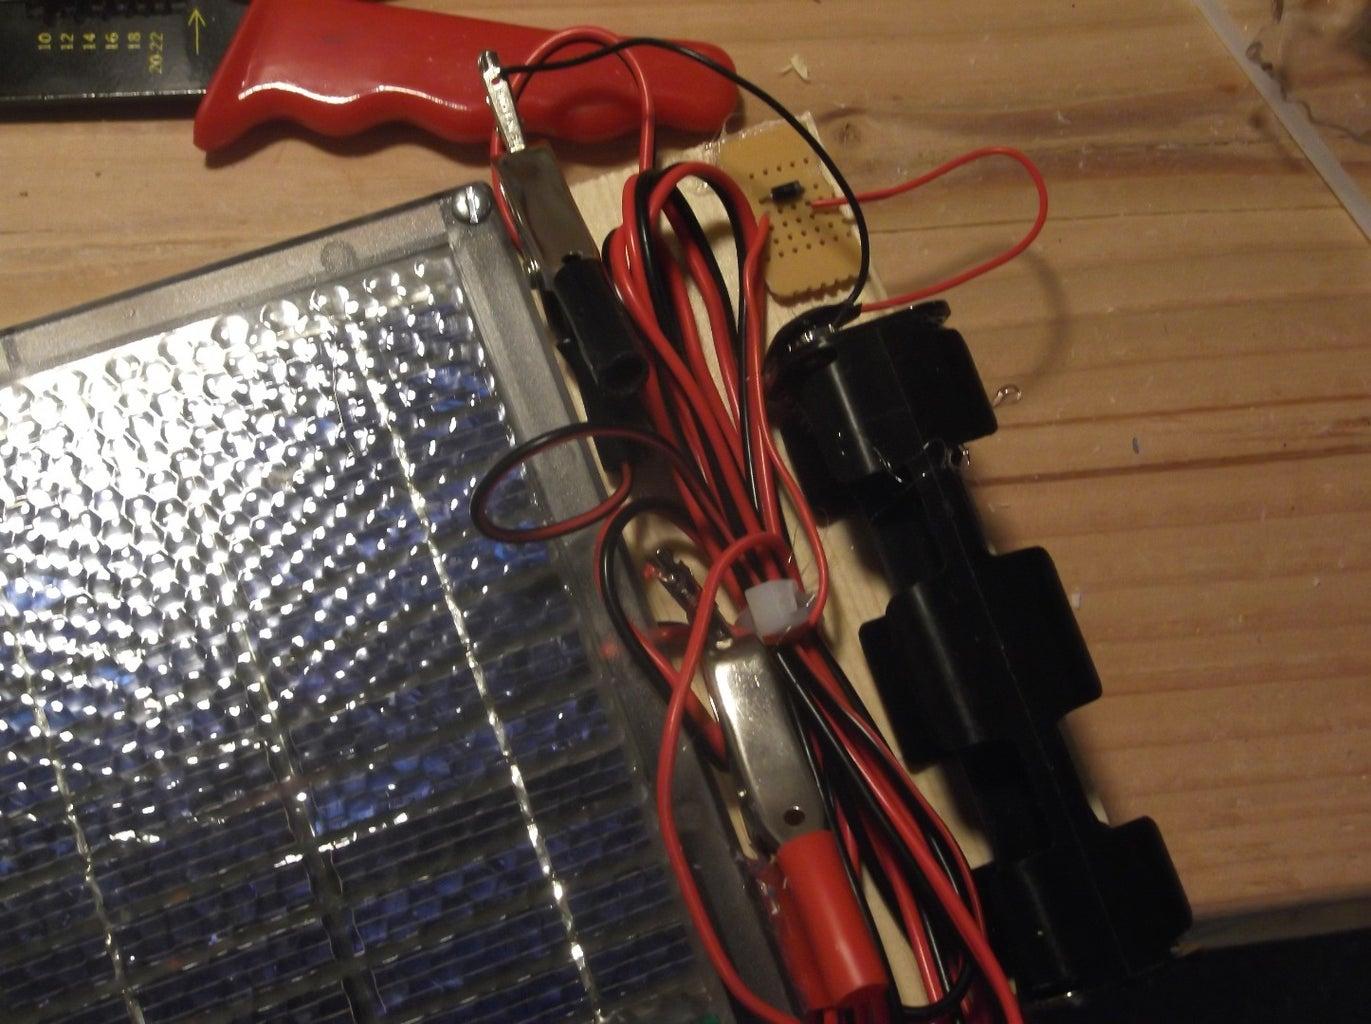 Putting Electronics Together